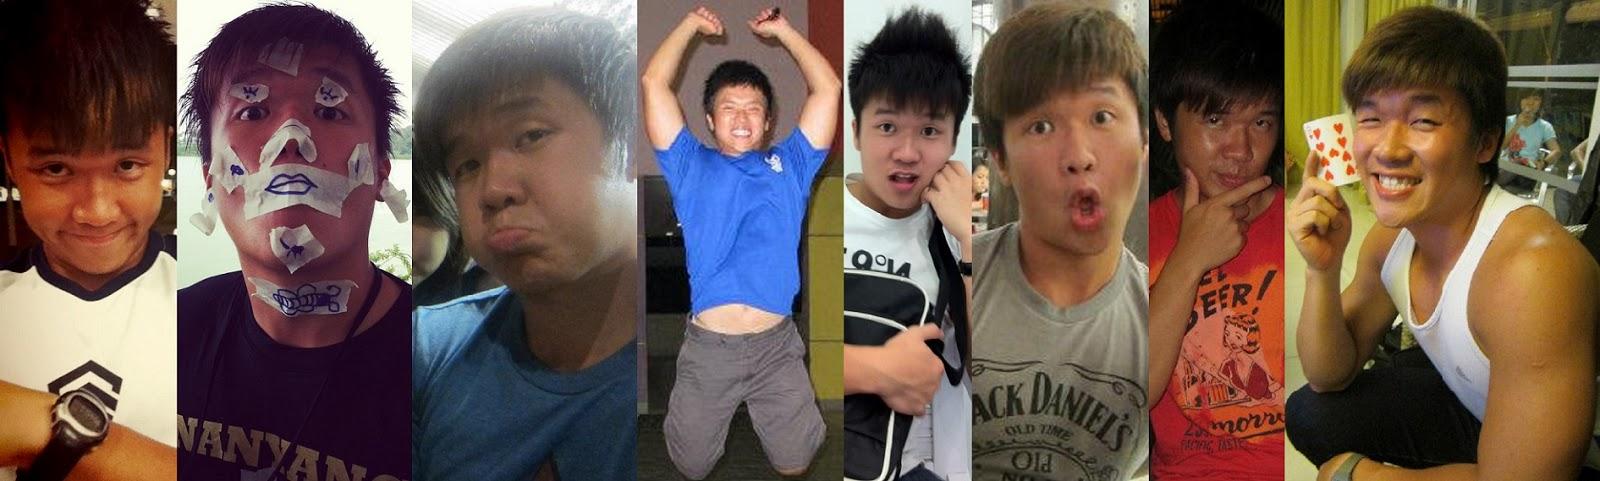 ManSA (Manhunt Singapore Alumni): September 2013